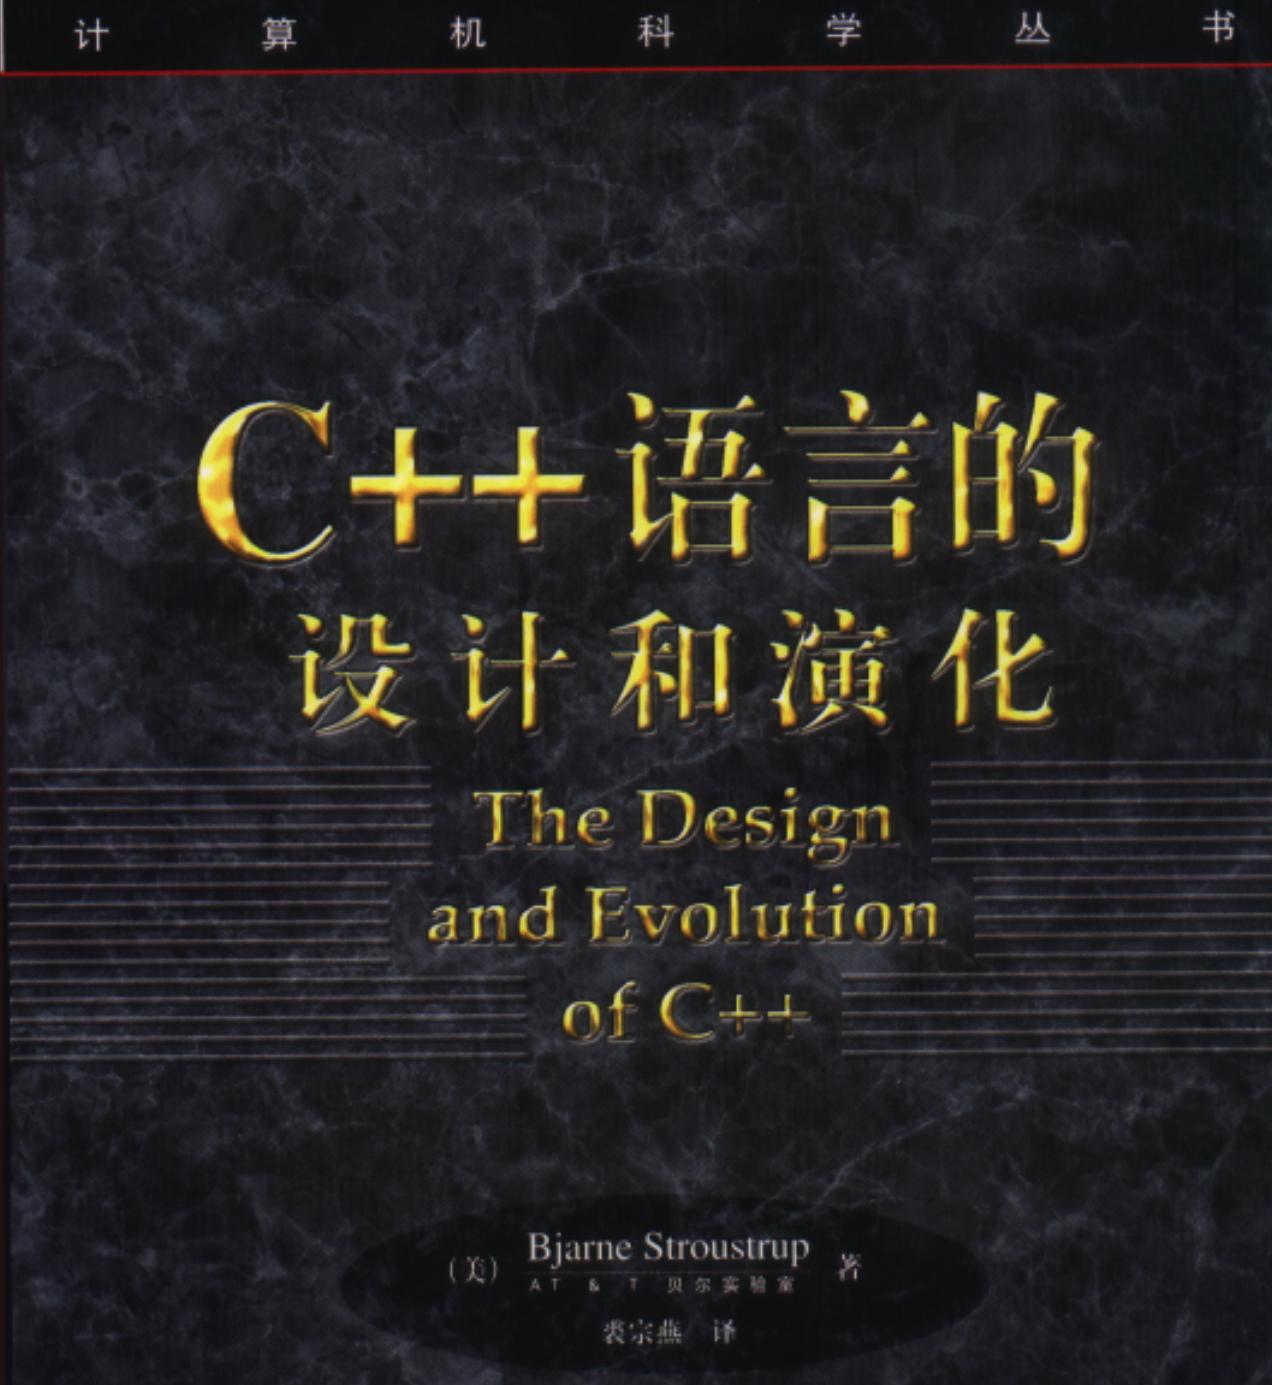 C++书籍2【中+英】 3